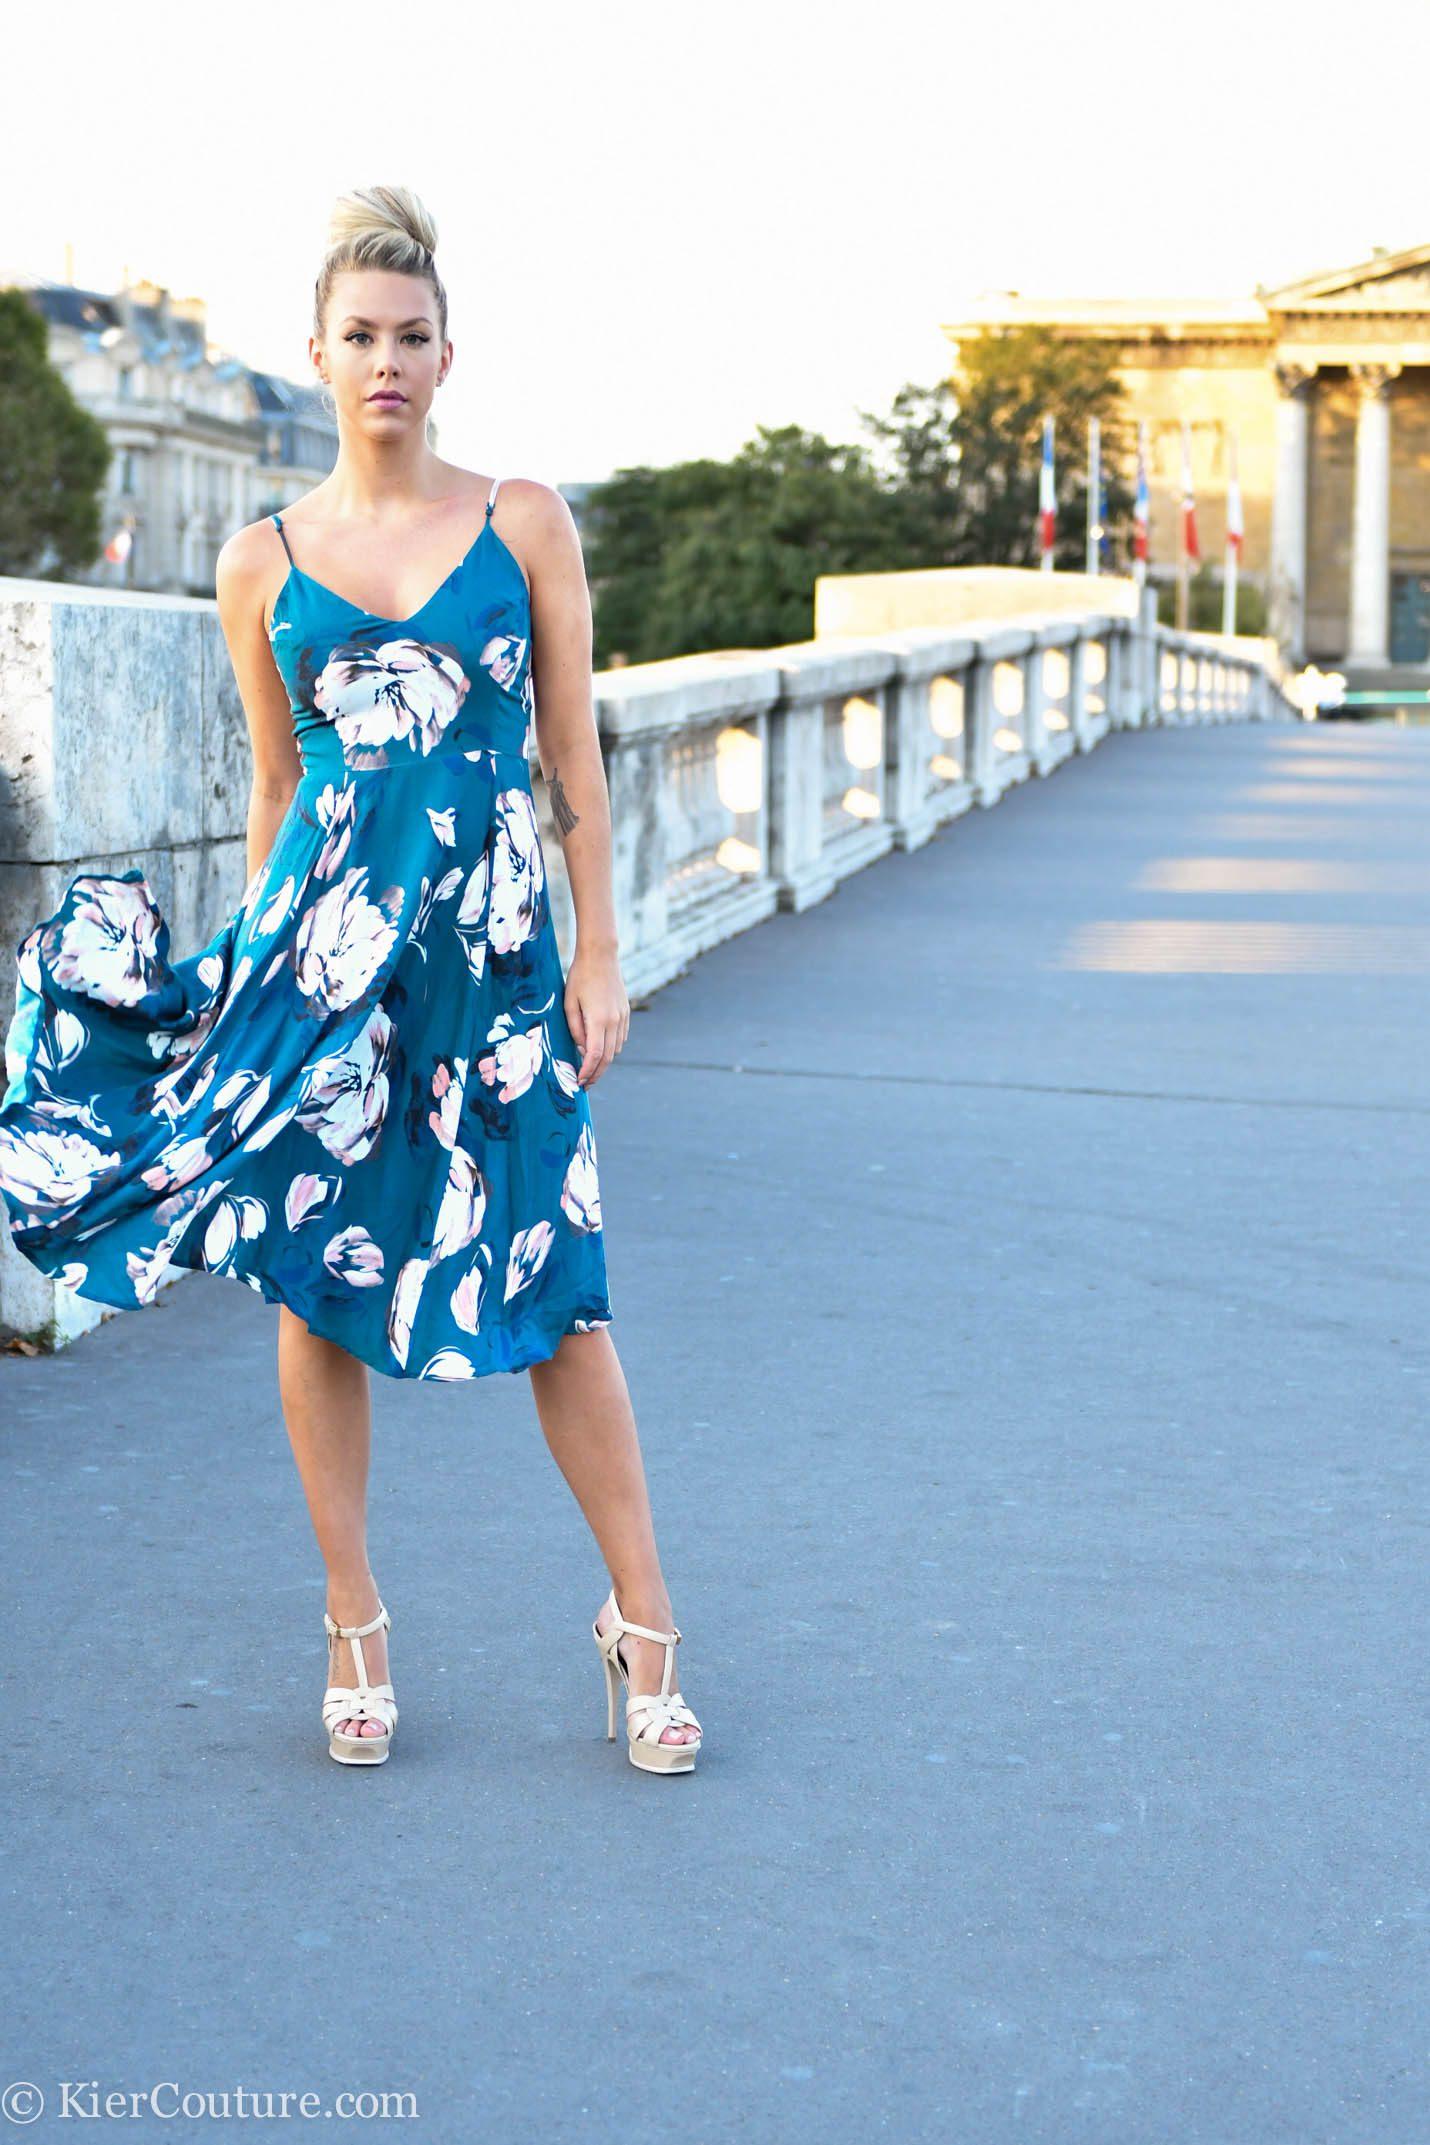 411c8ed36ff11 Yumi Kim Moonlight Dress - Kier Couture